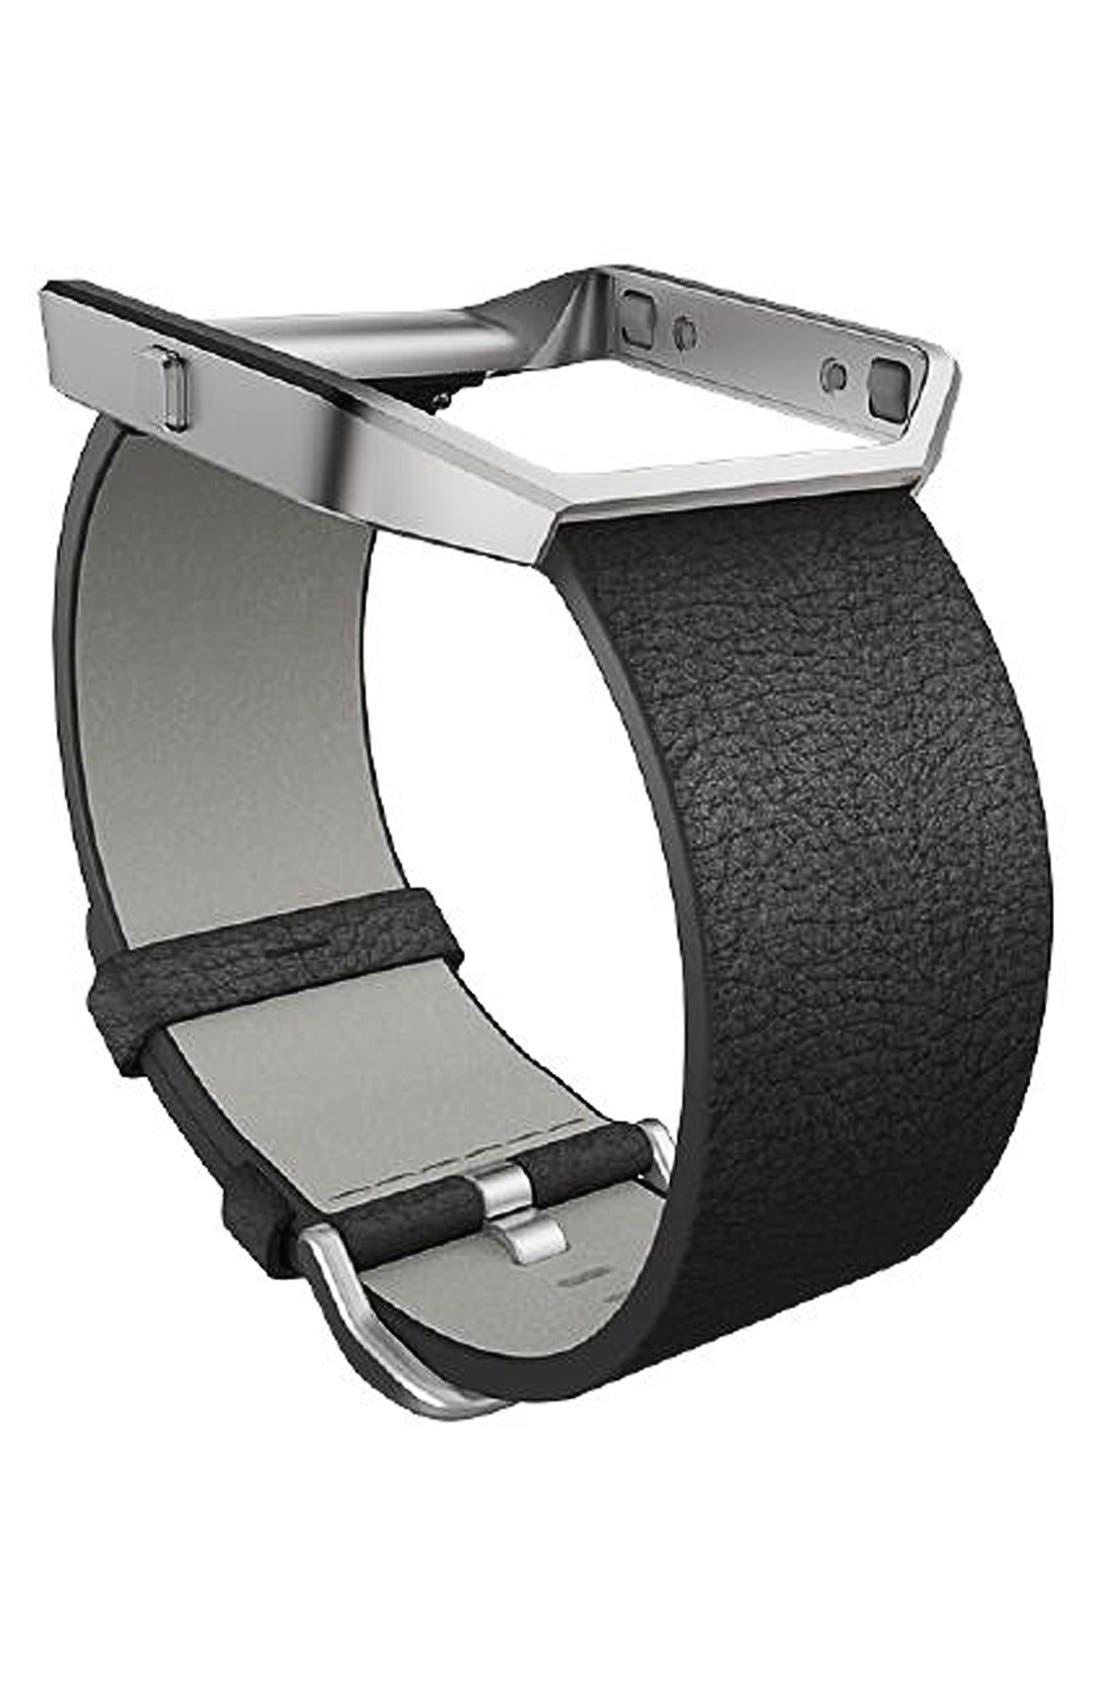 Fitbit Blaze Leather Smart Watch Band